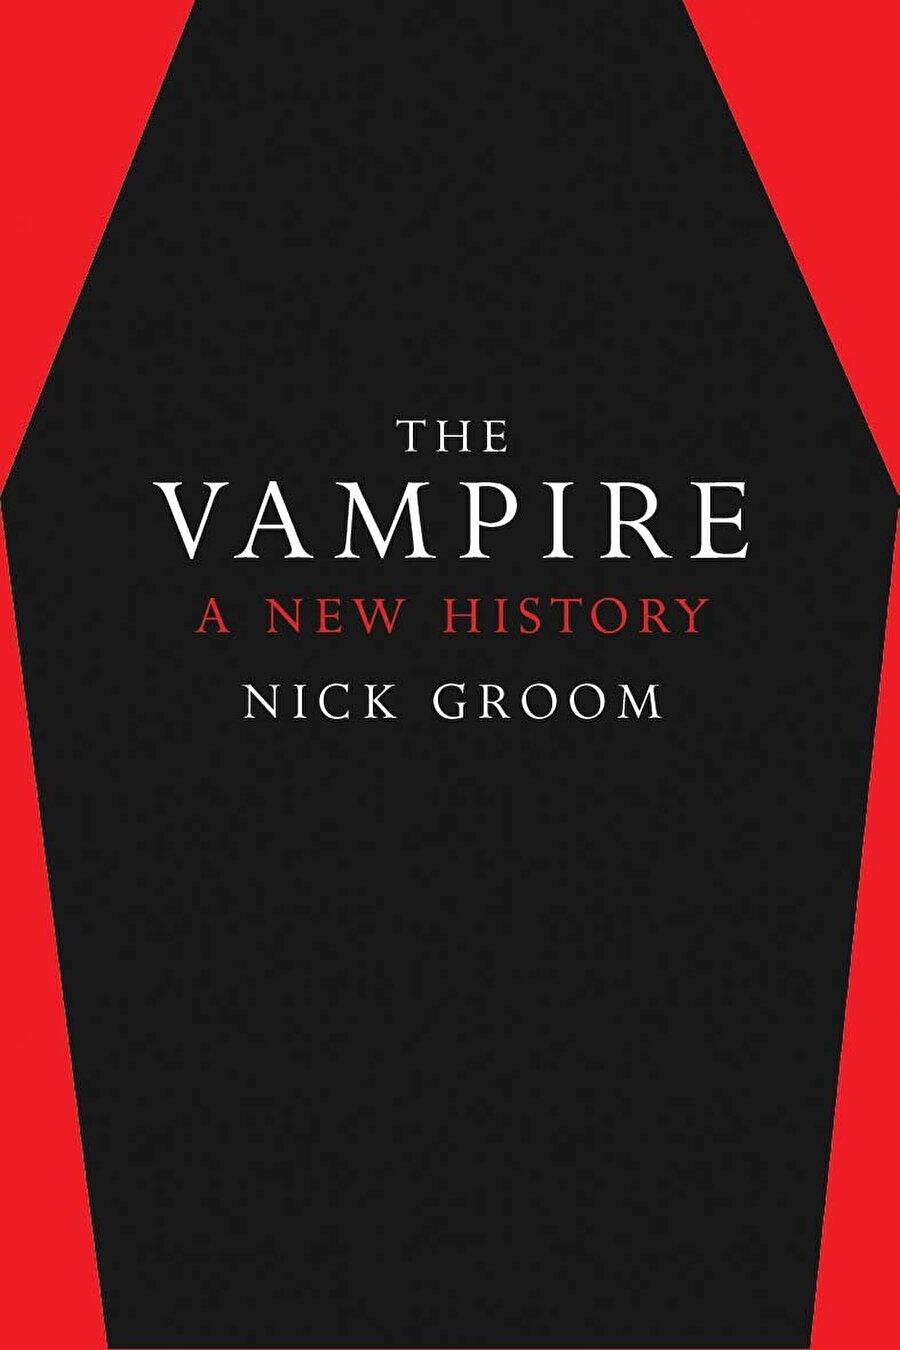 Nick Groom, The Vampire: A New History, Yale University Press, 2018